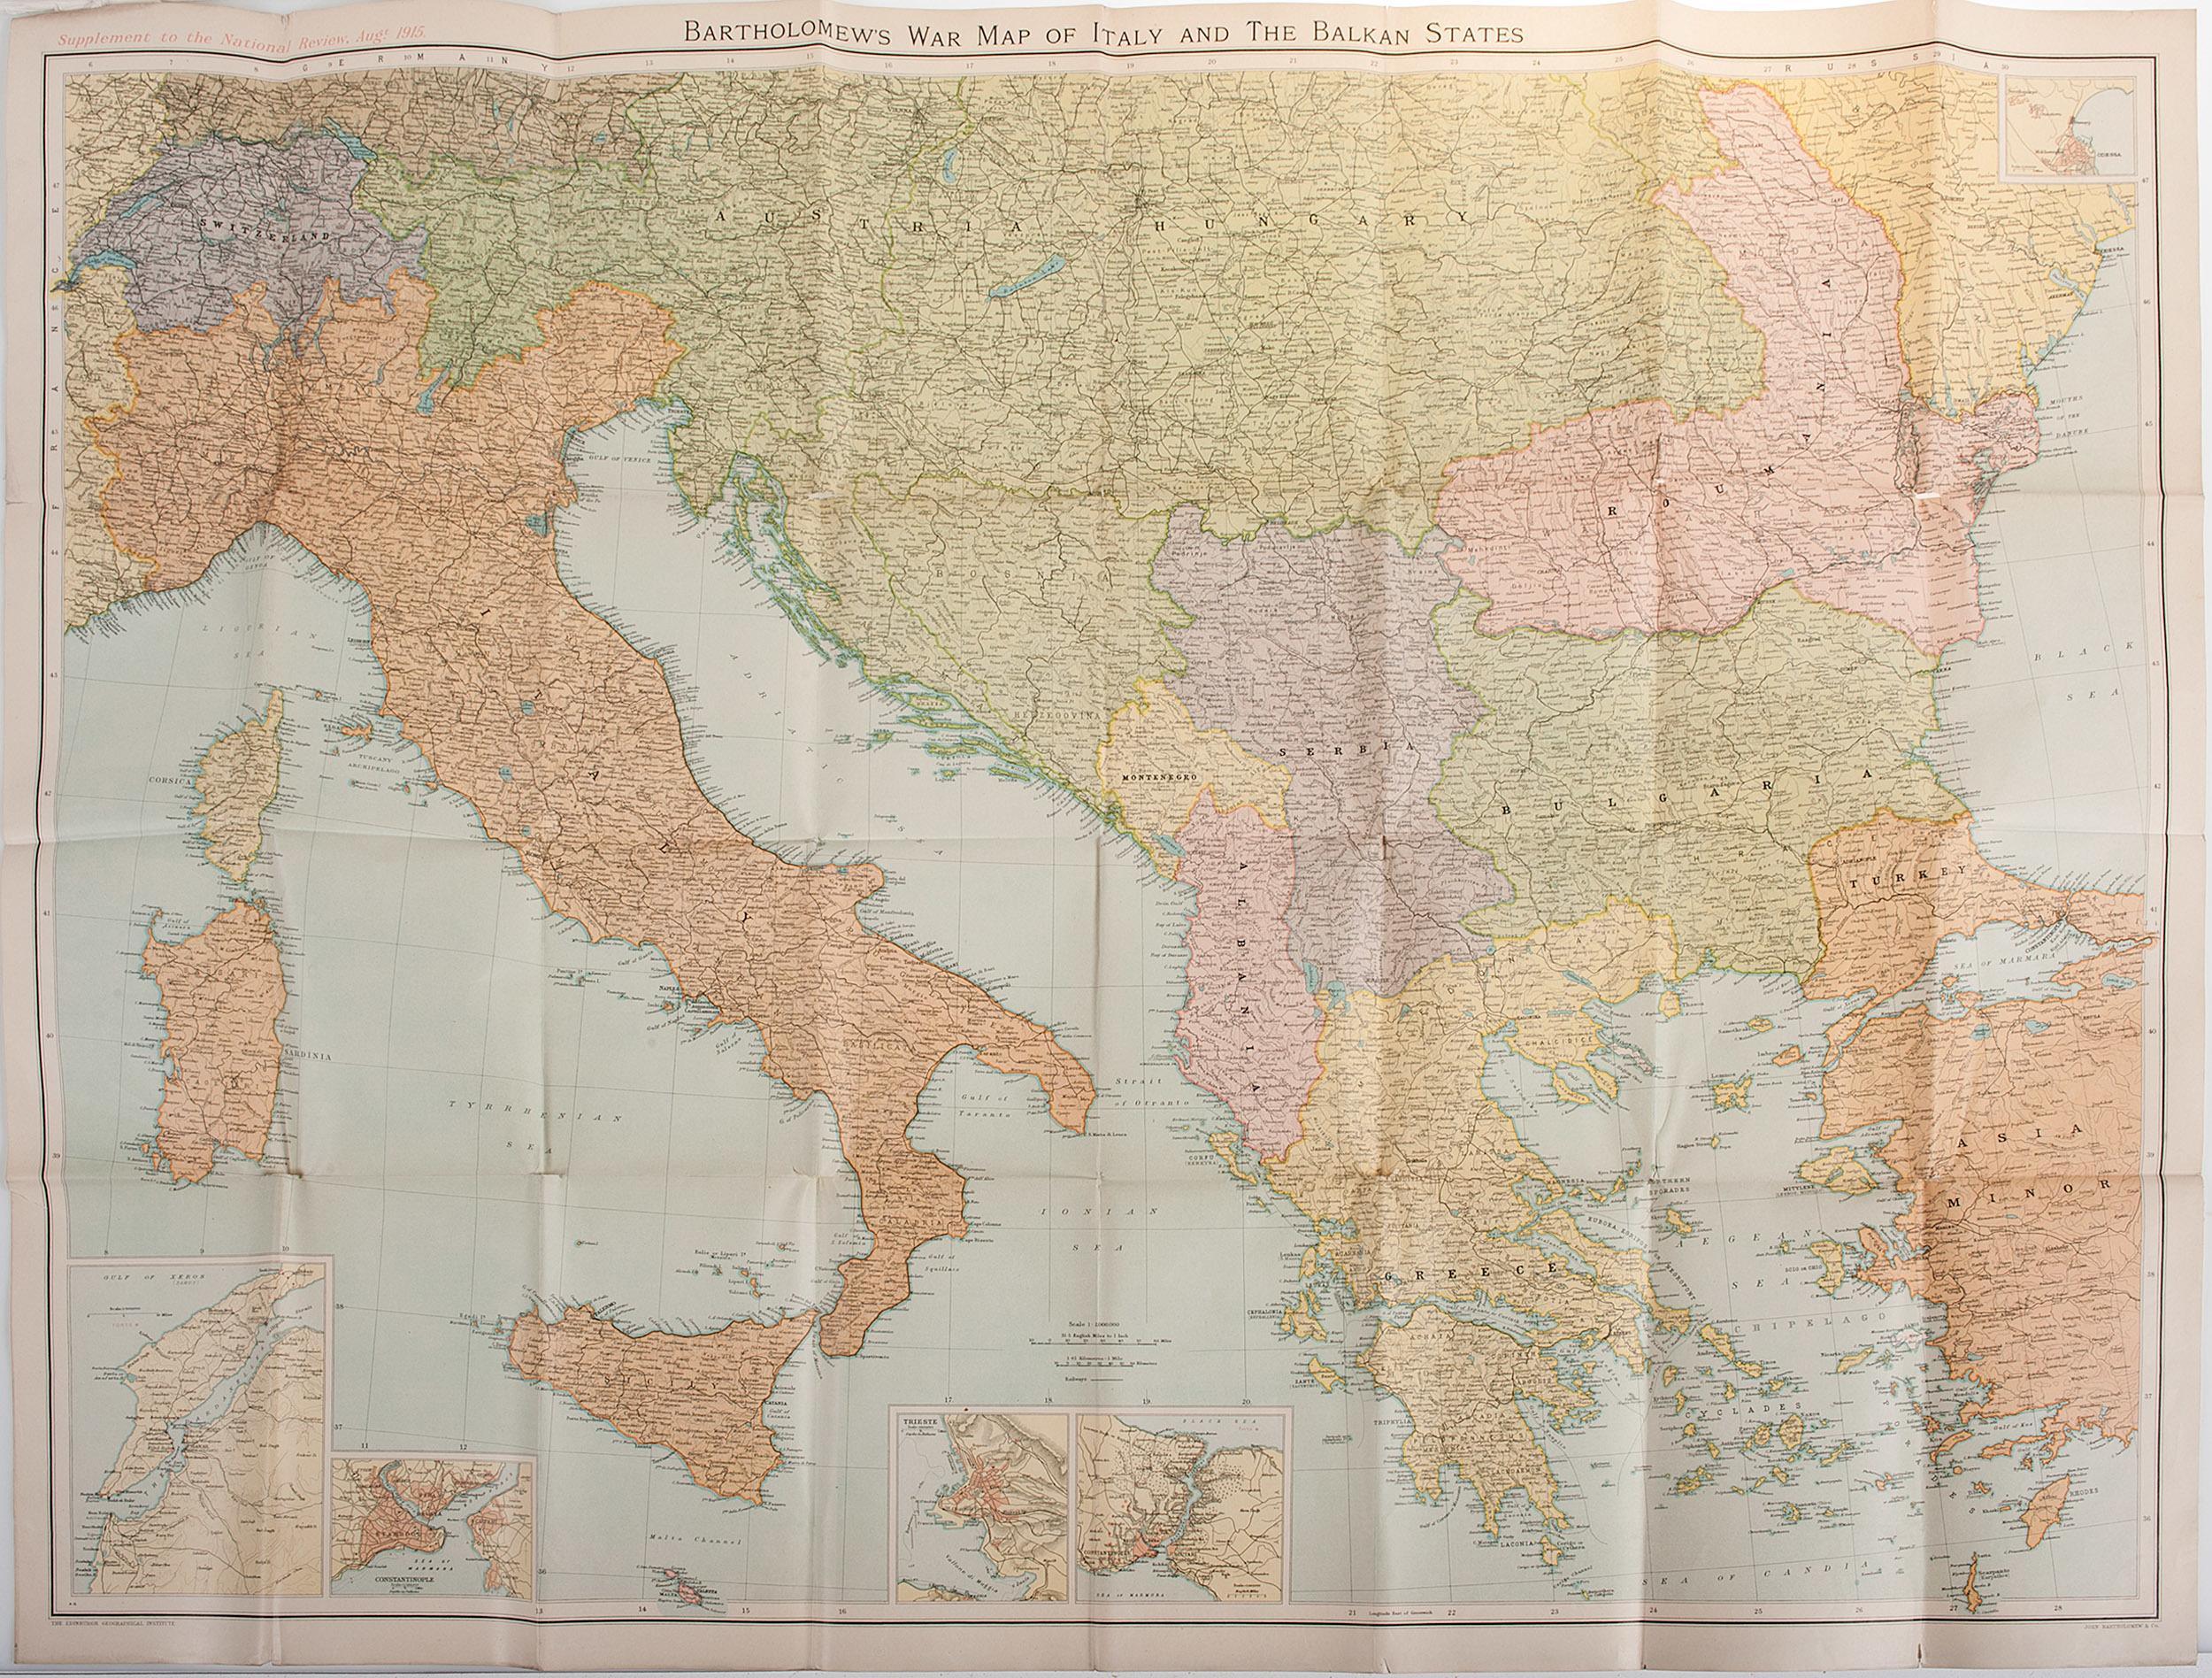 Military world war one cartography miscellaneous maps wwi military world war one cartography miscellaneous maps wwi national review gumiabroncs Choice Image